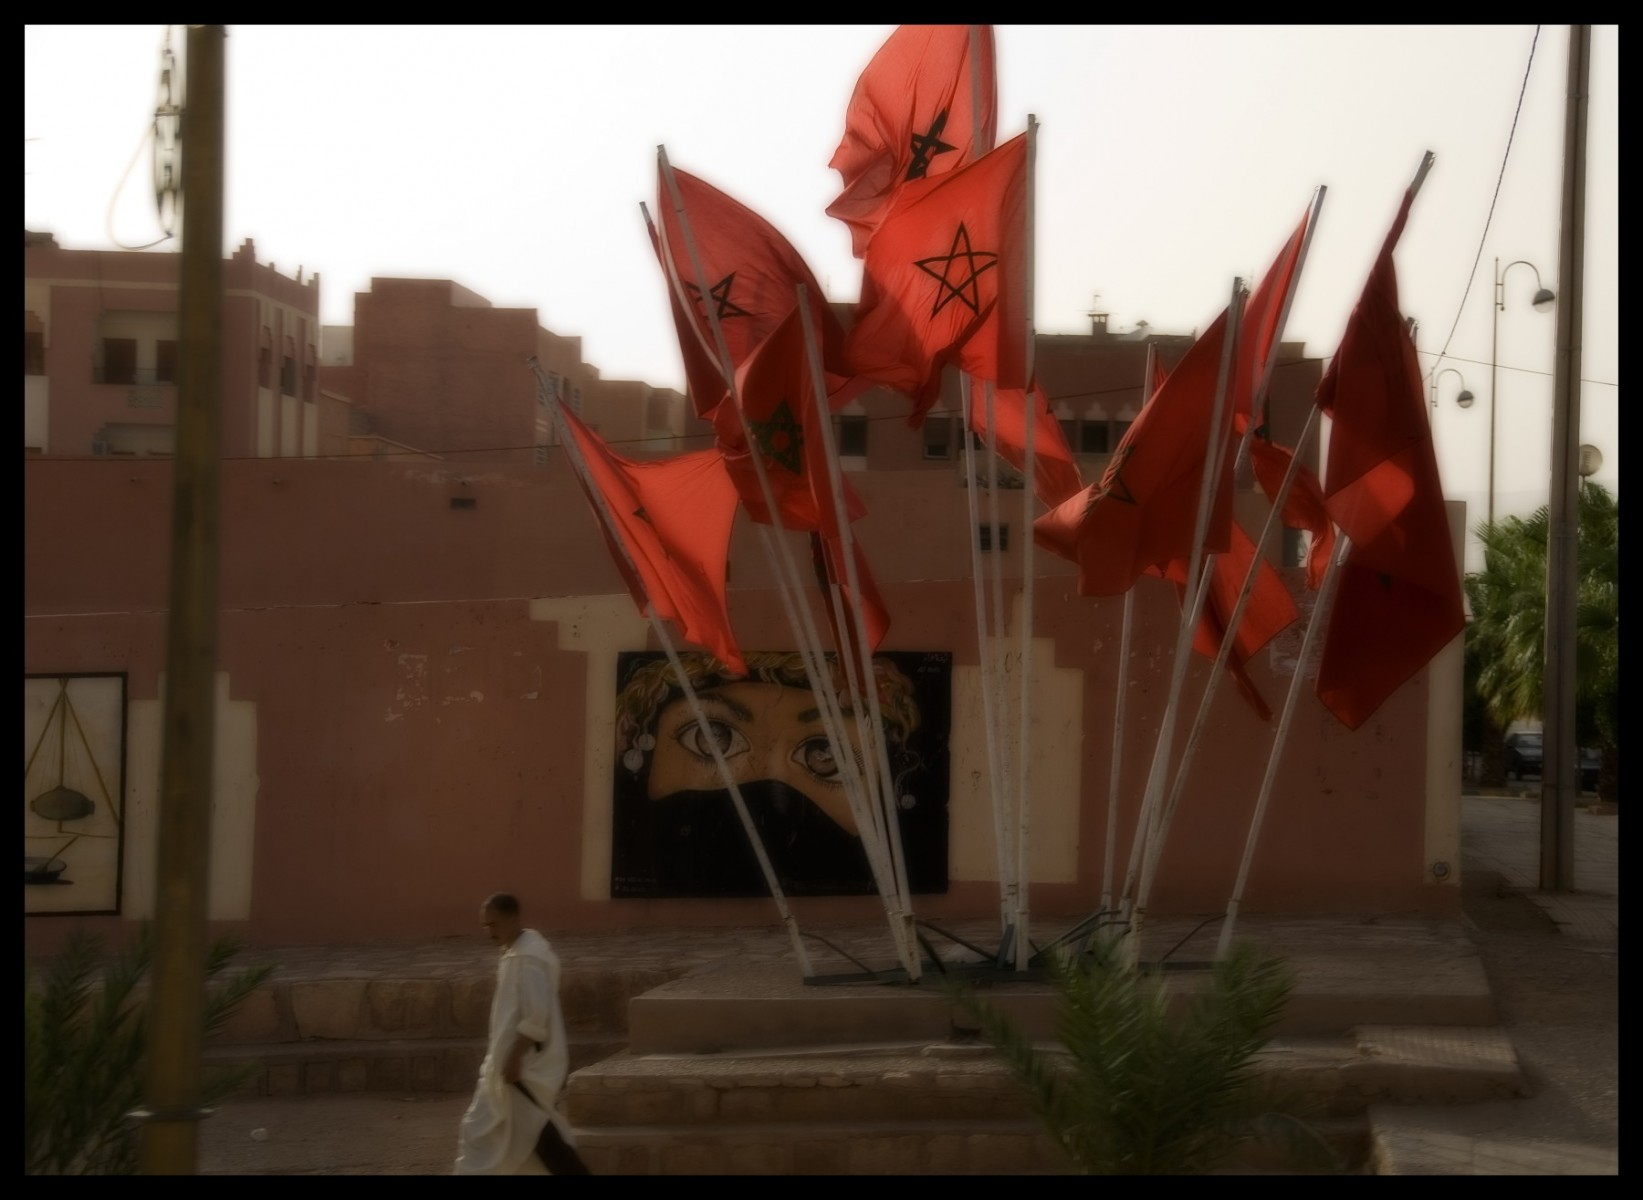 98617_DSC0073 red morocco